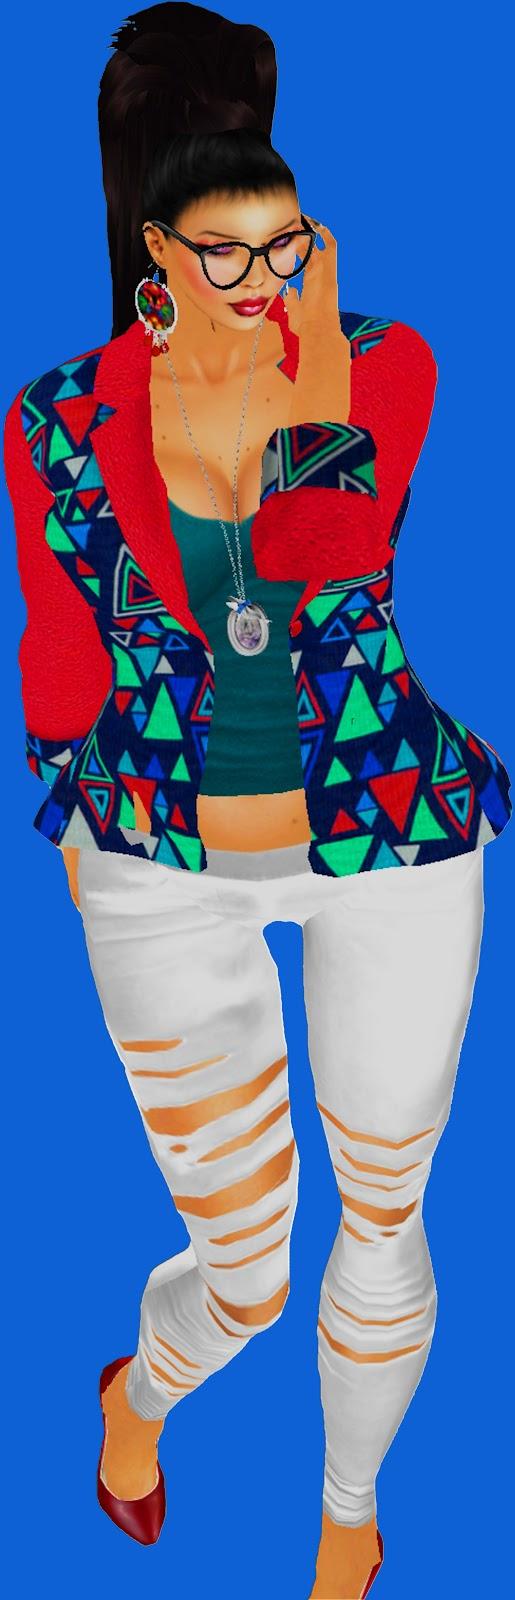 Designers Originals Studio Christmas Sweater Upc